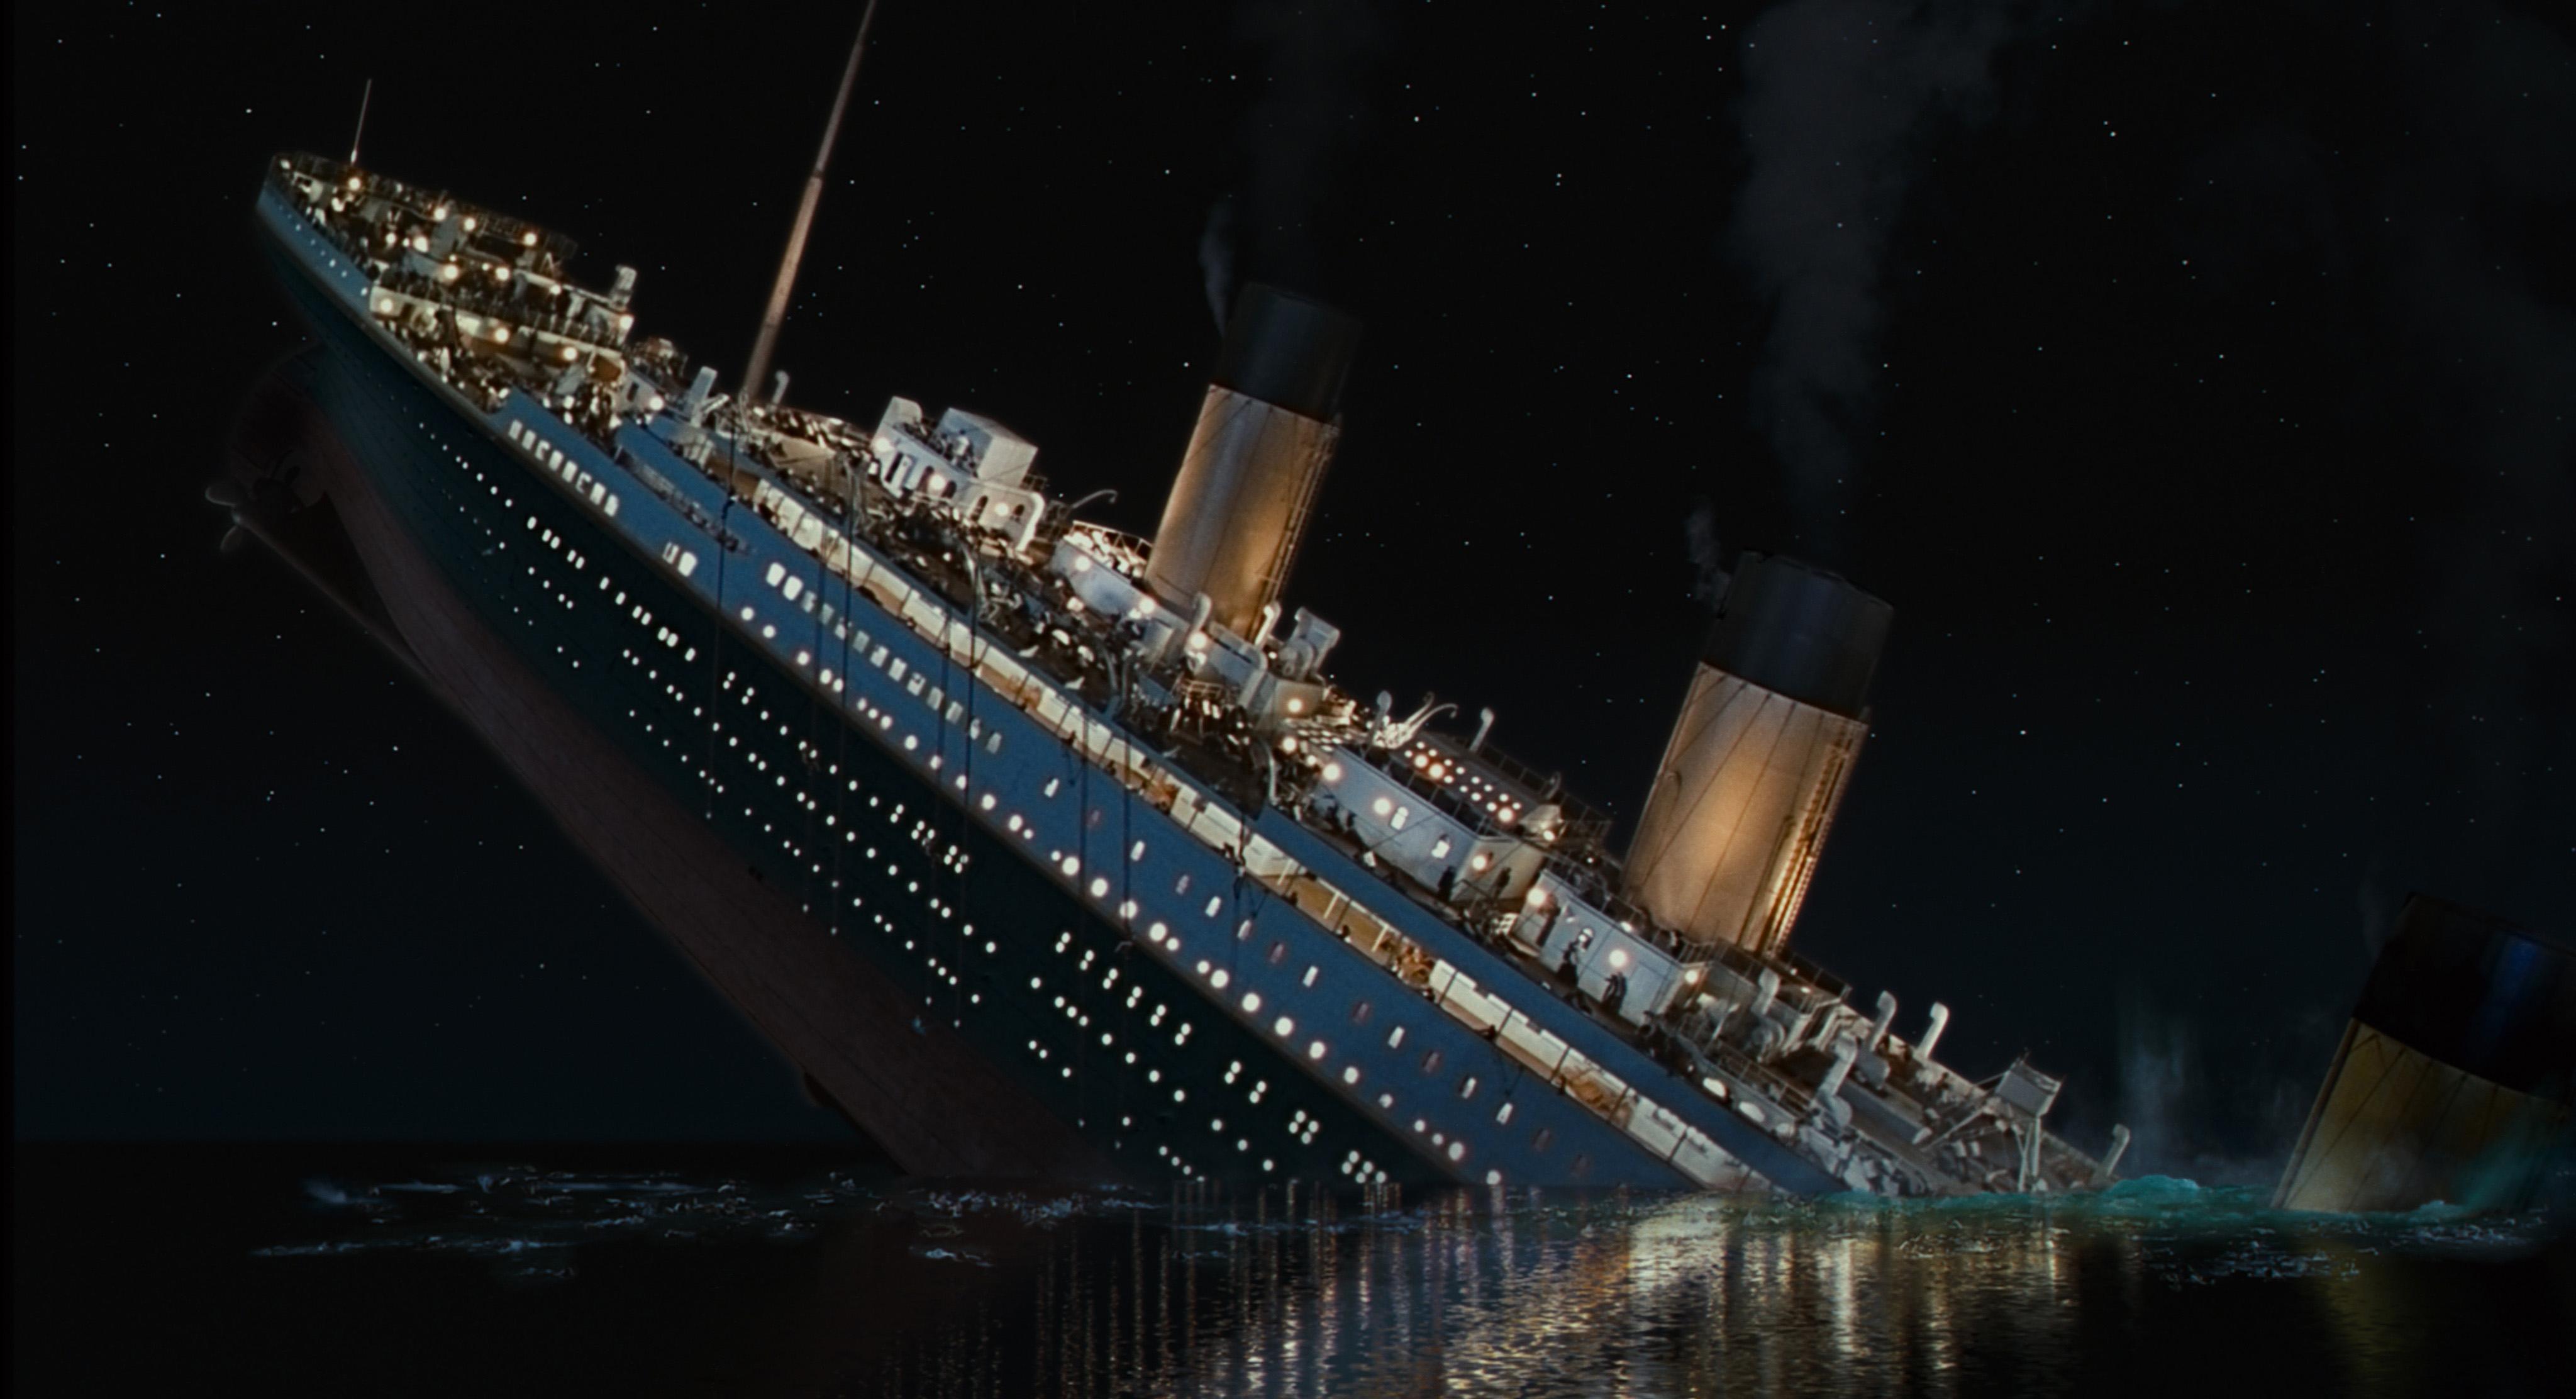 Wallpaper Titanic Ship Wallpapersafari